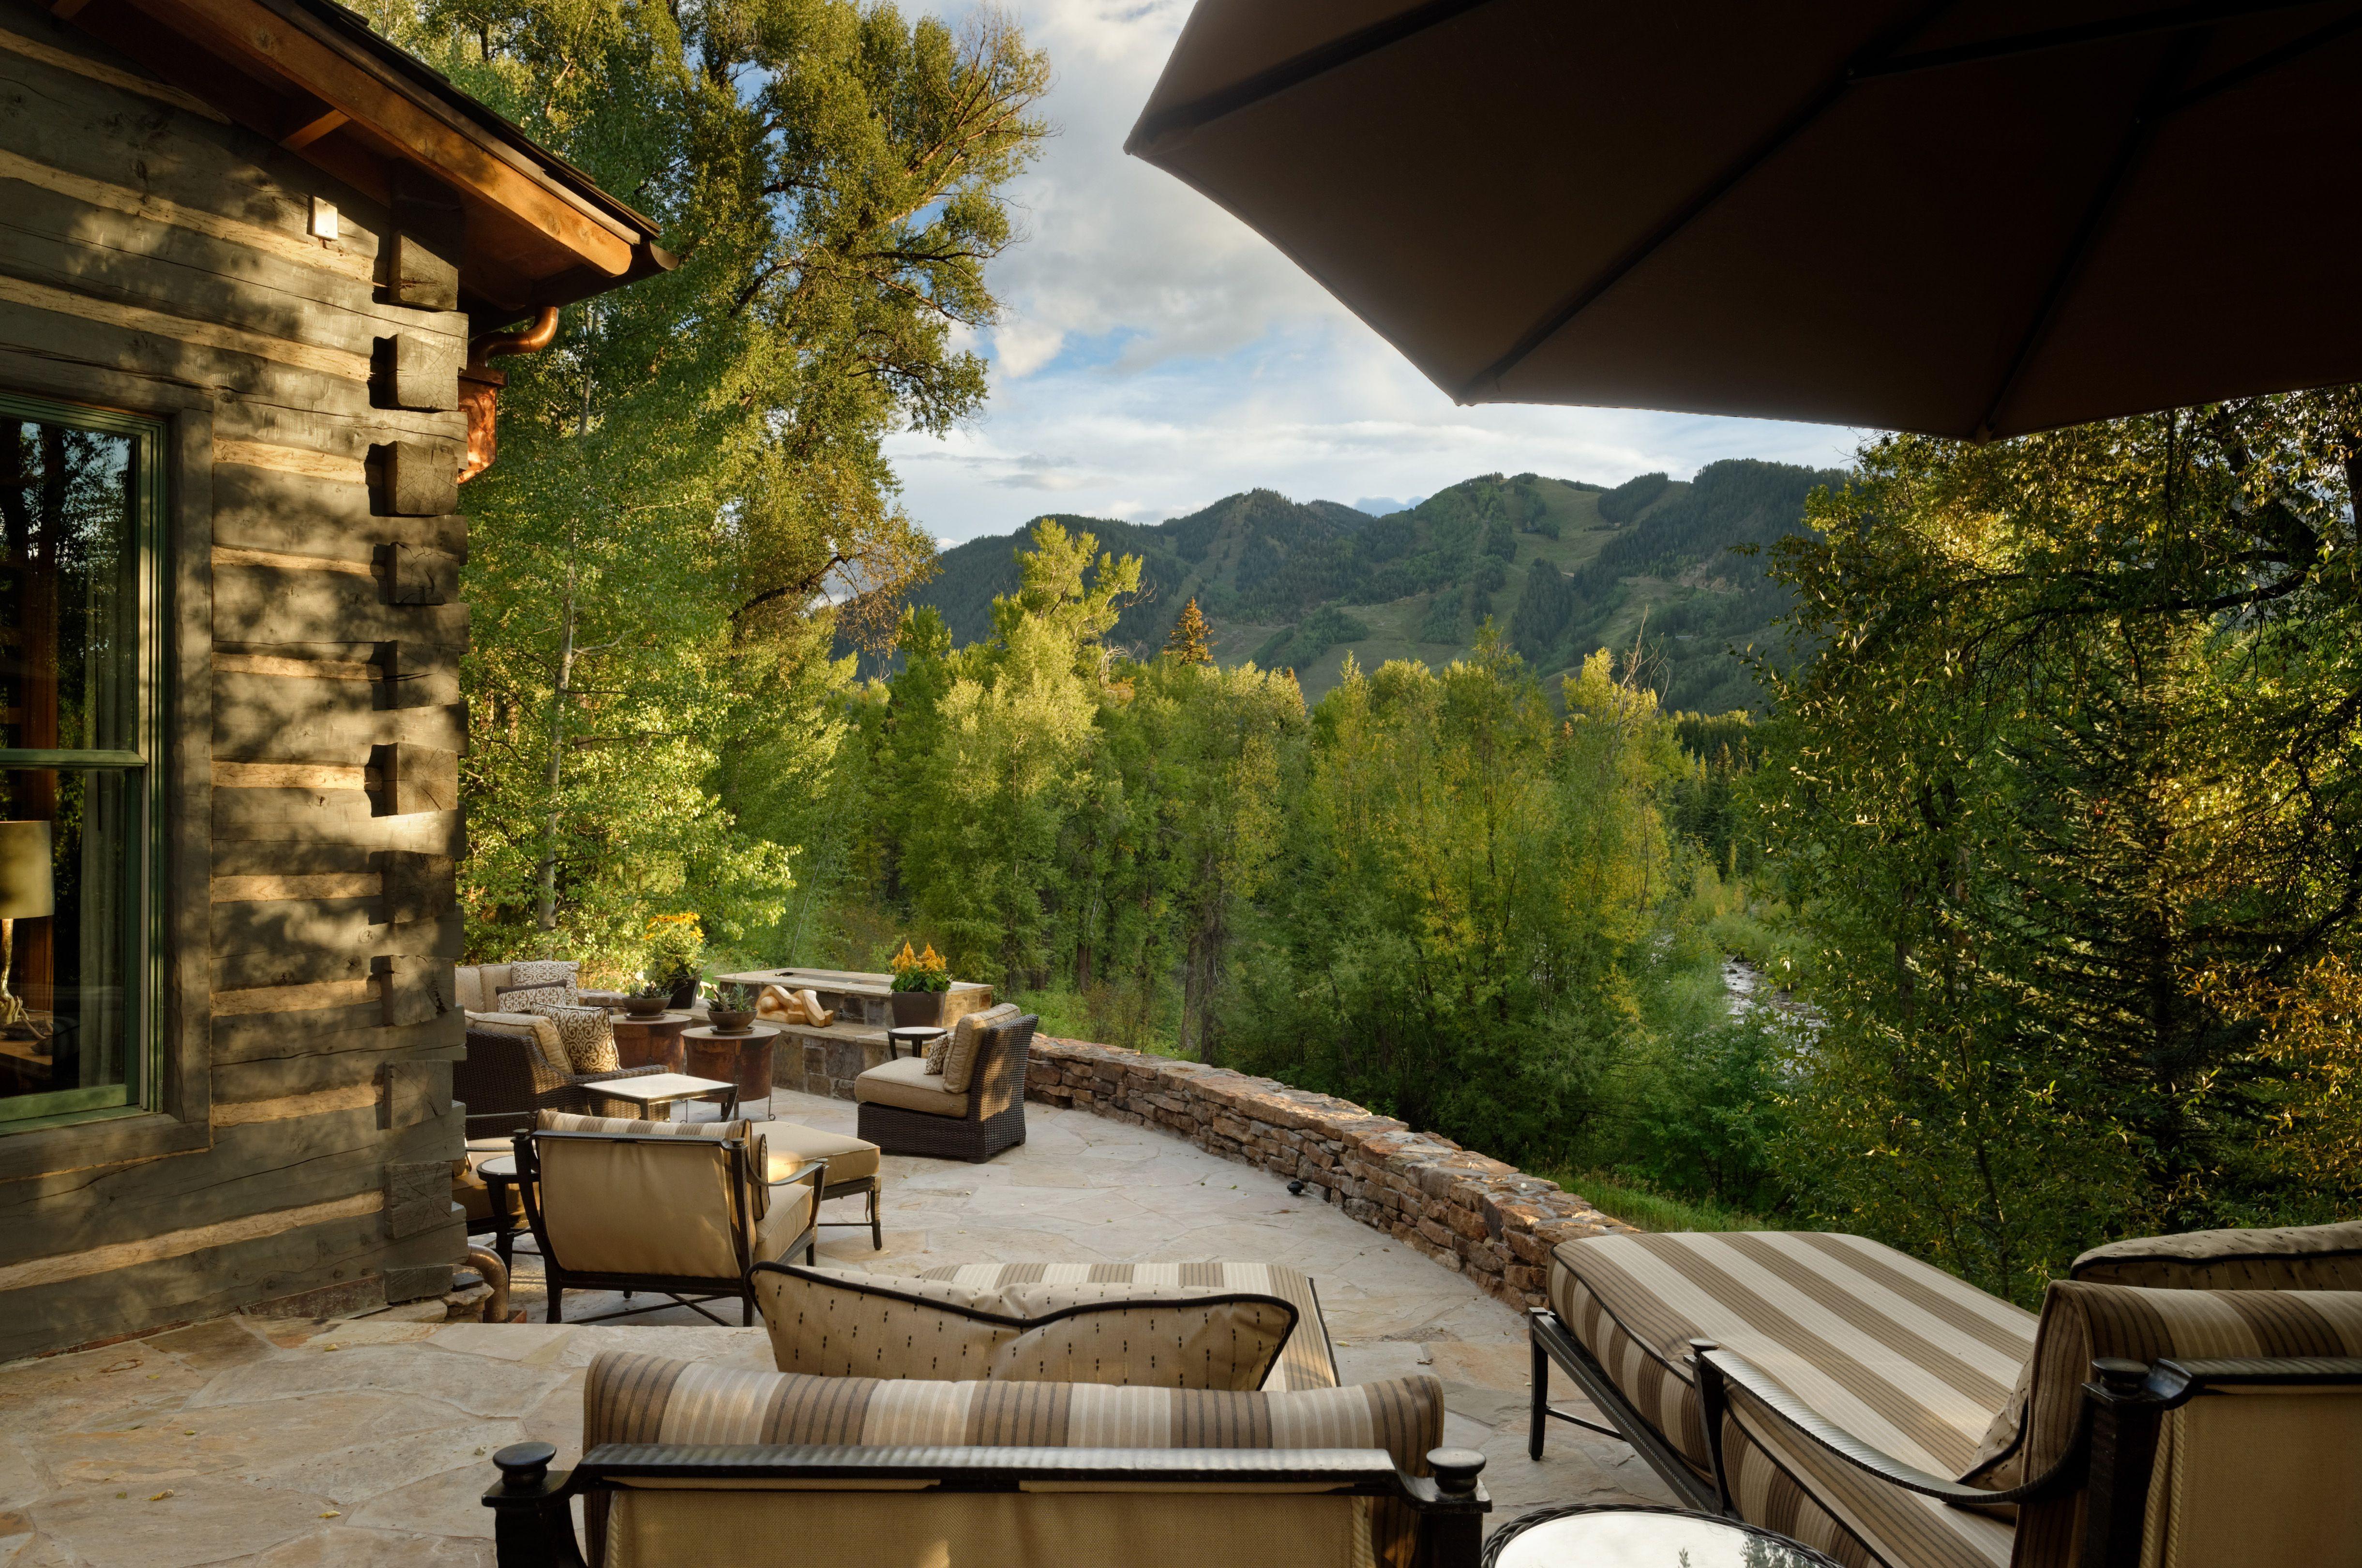 Aspen Log Cabin With a view Aspen CO